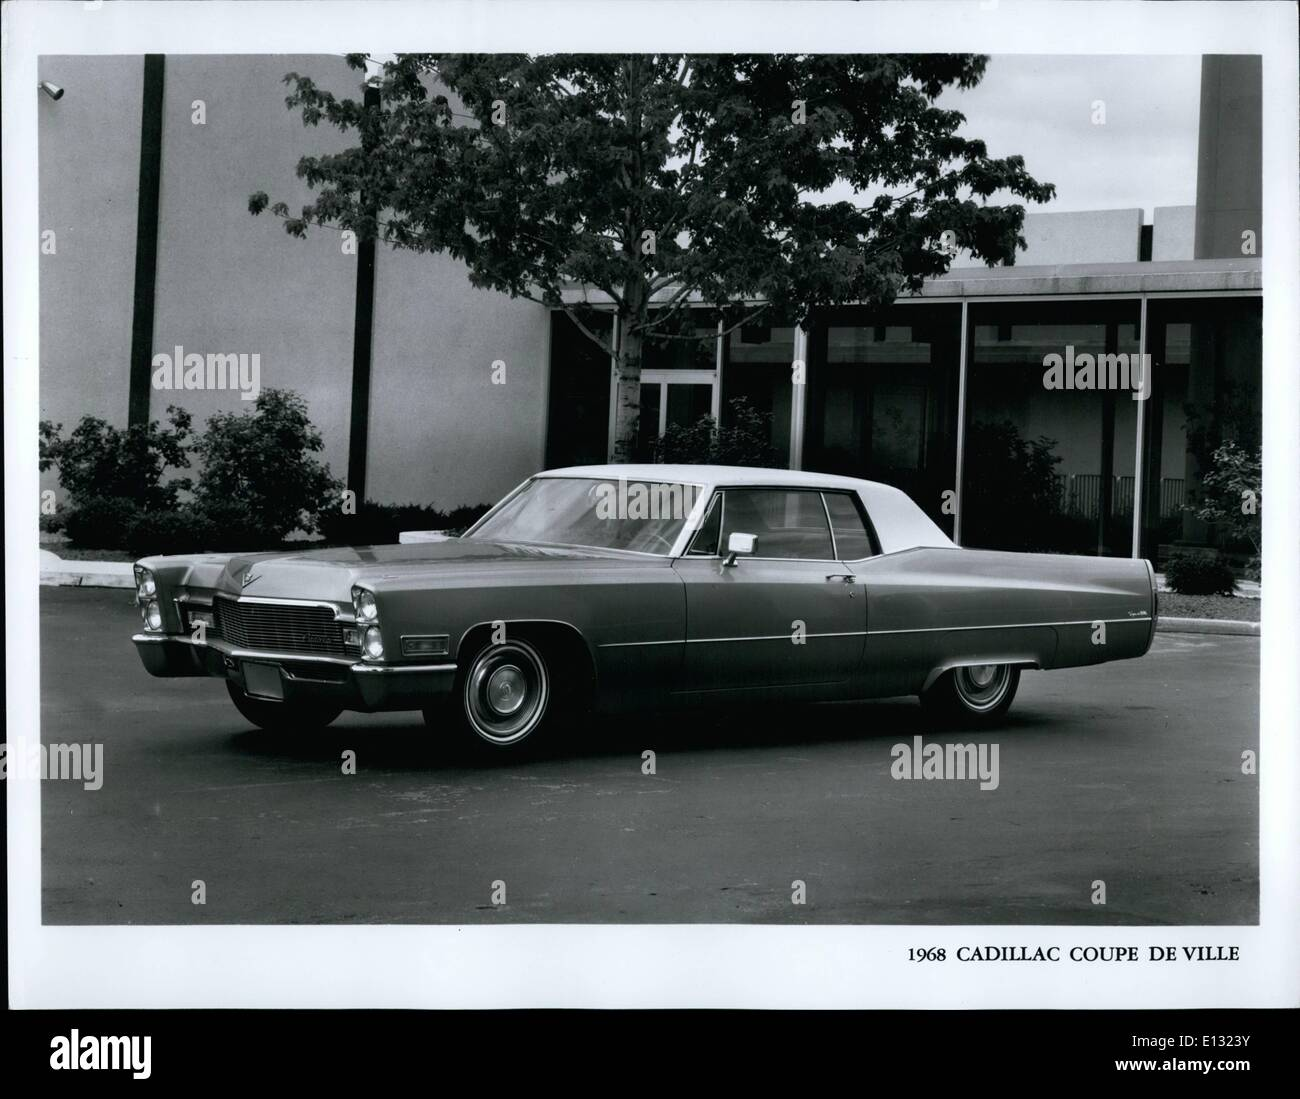 Feb. 26, 2012 - 1968 Cadillac Coupe De Ville - Stock Image